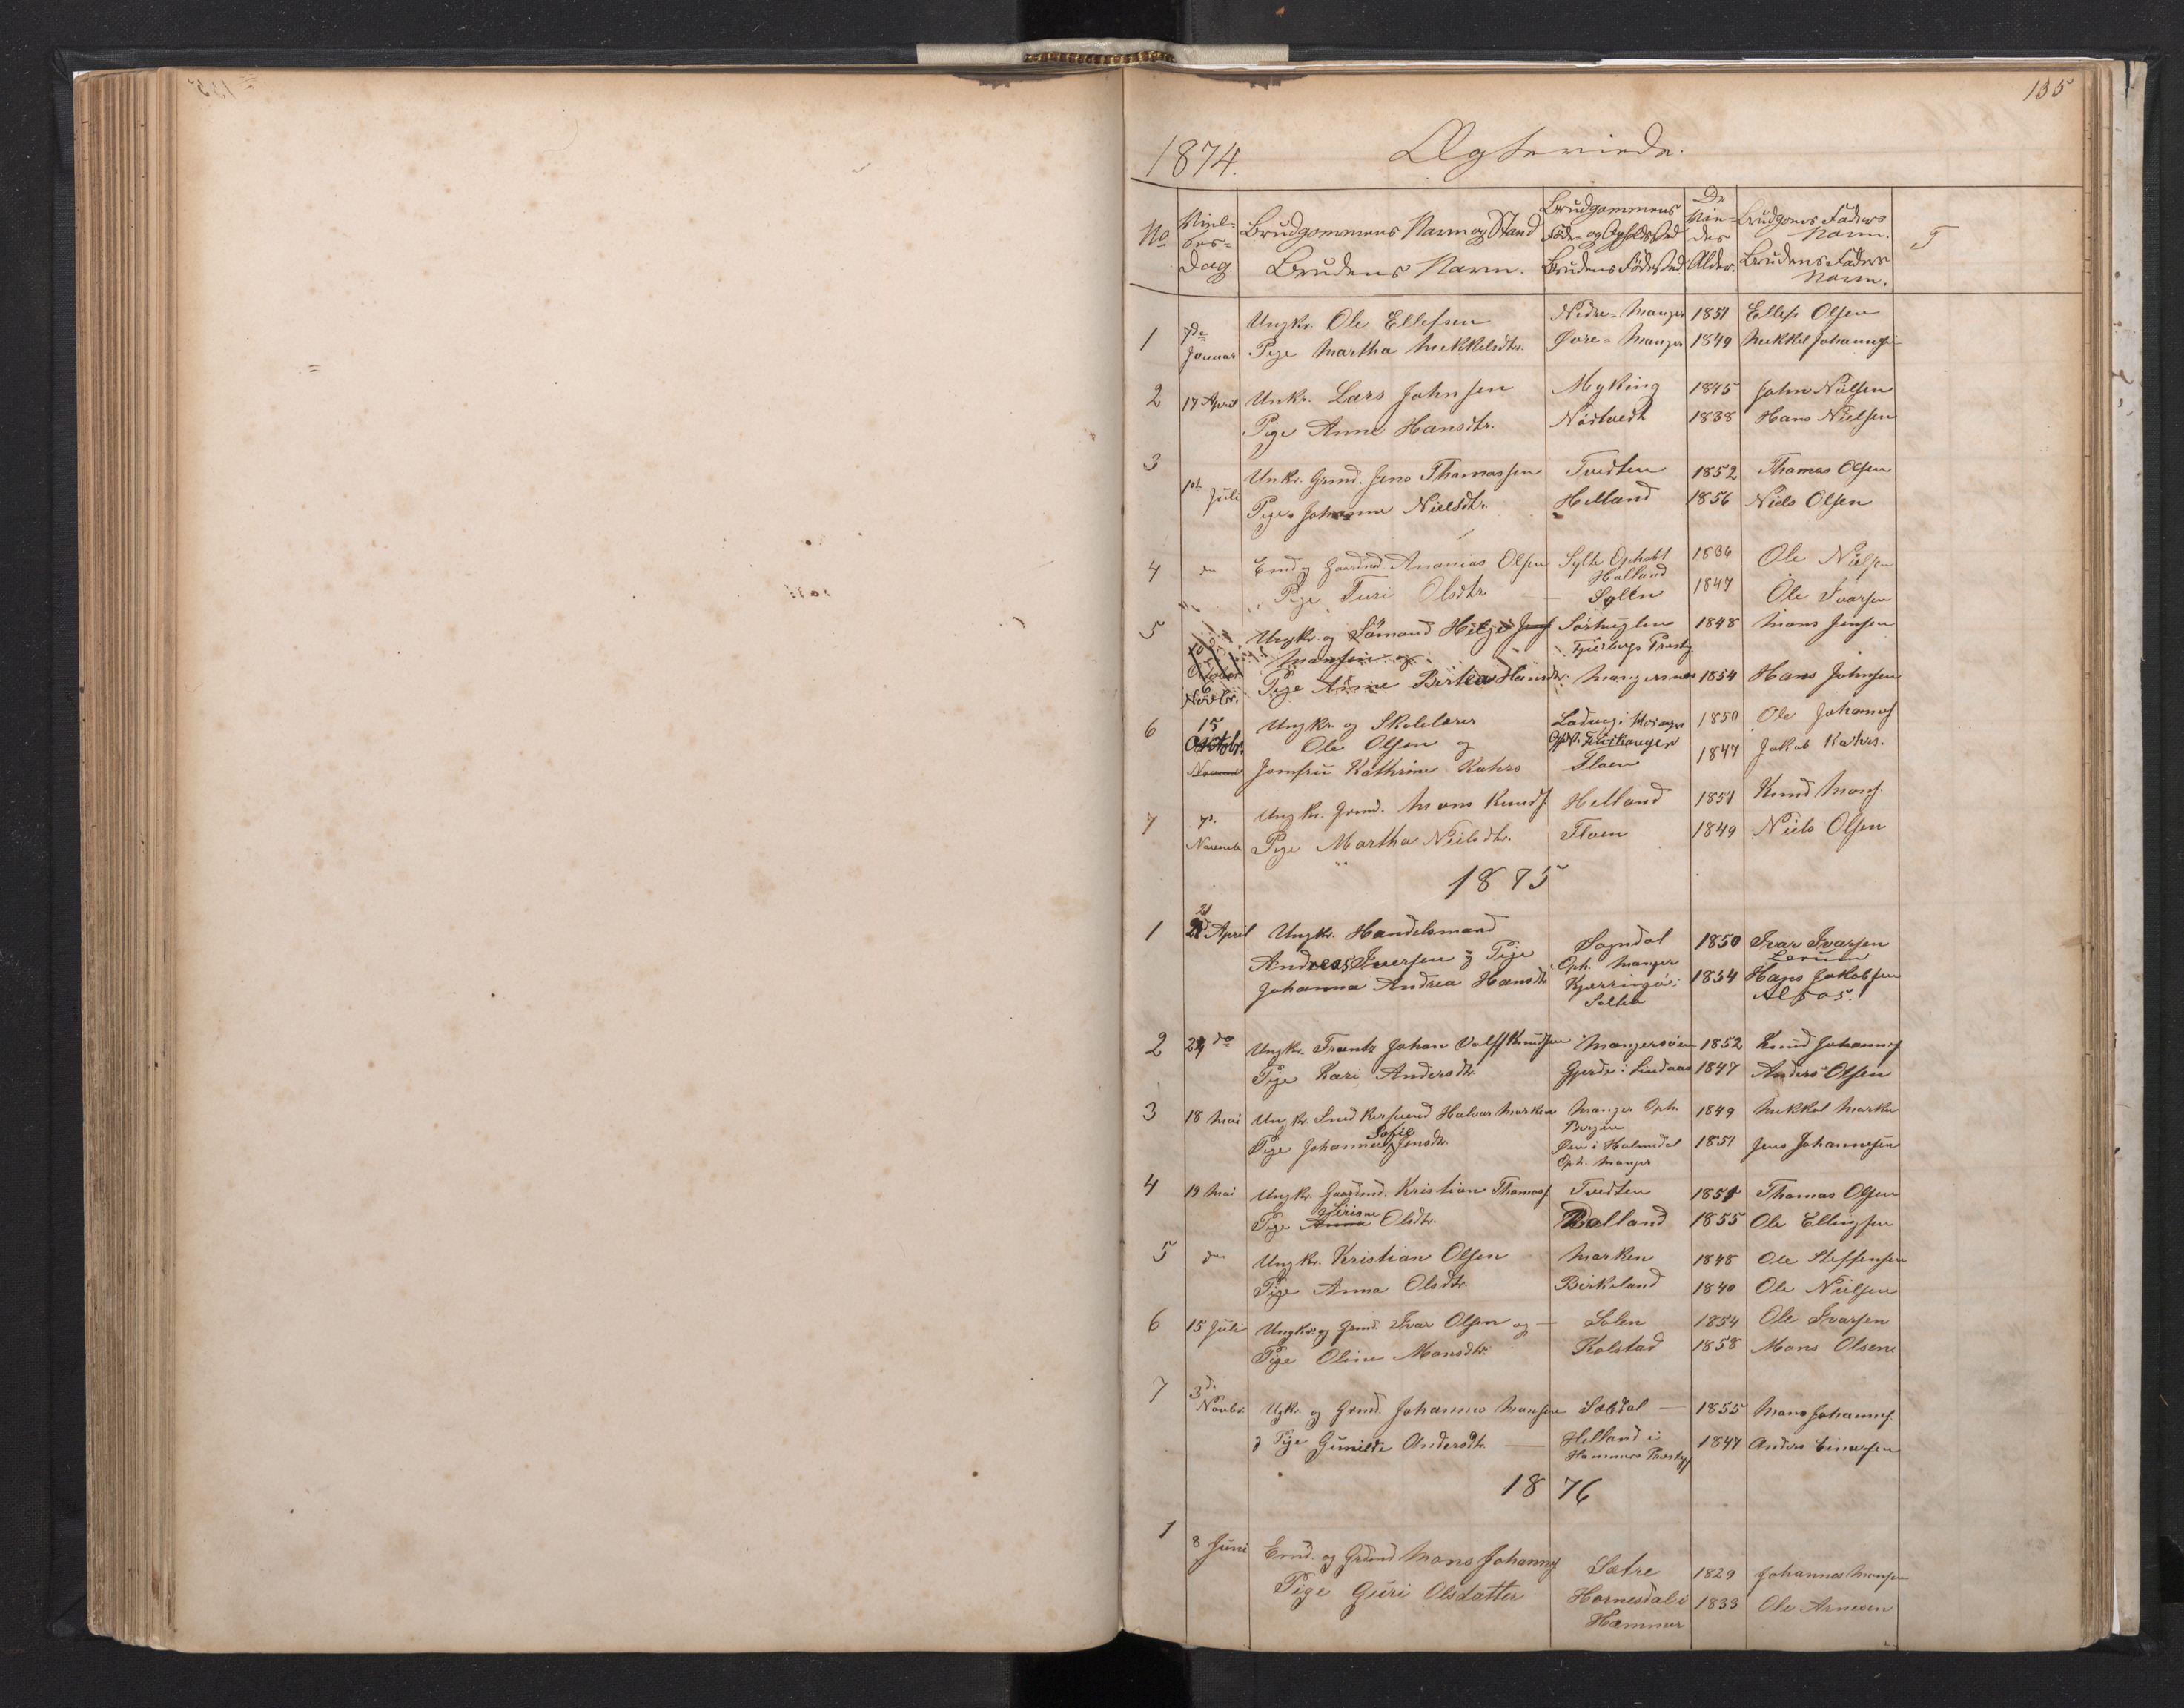 SAB, Manger sokneprestembete, H/Hab: Klokkerbok nr. A 1, 1874-1901, s. 134b-135a